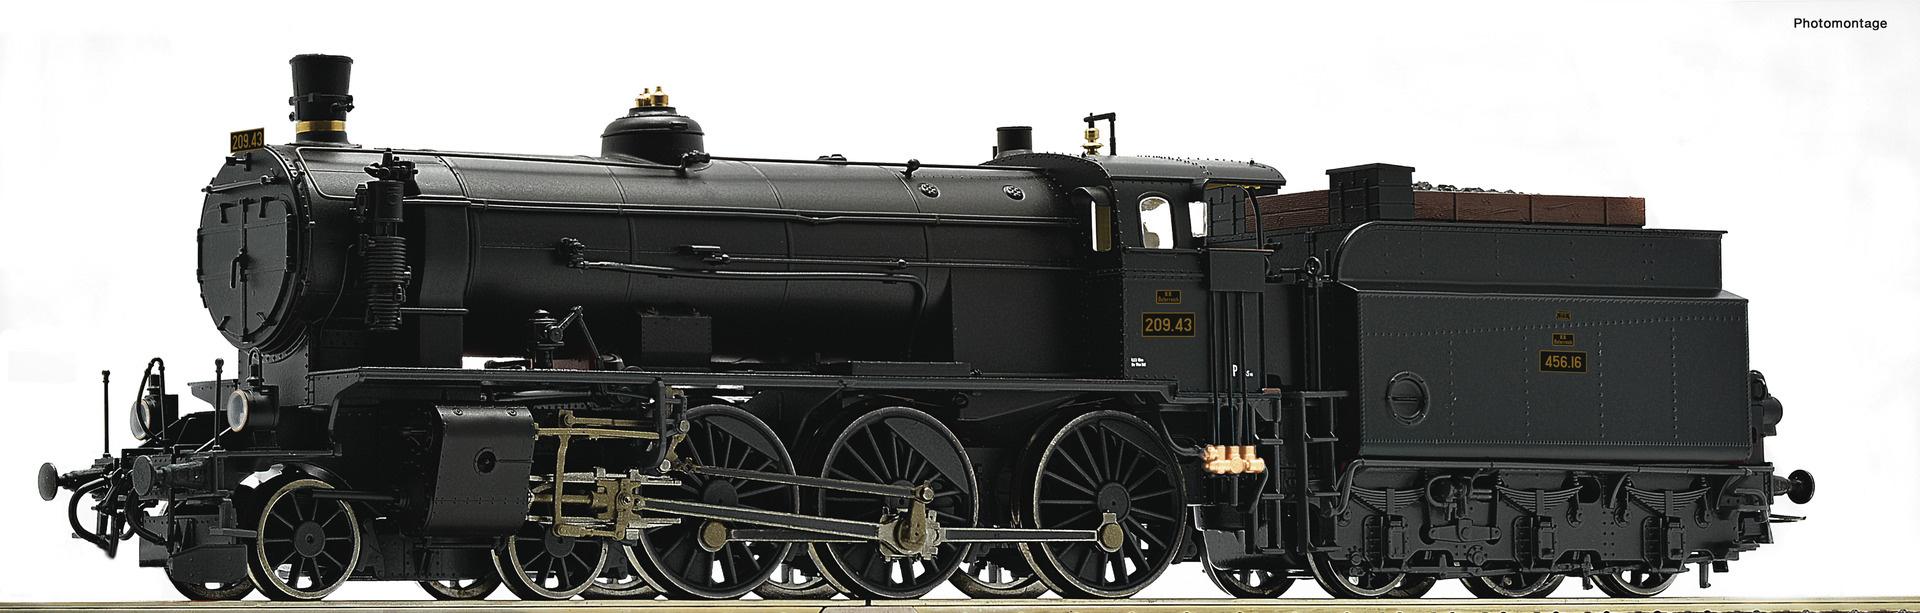 72108 Dampflok Rh 209 BBÖ-1